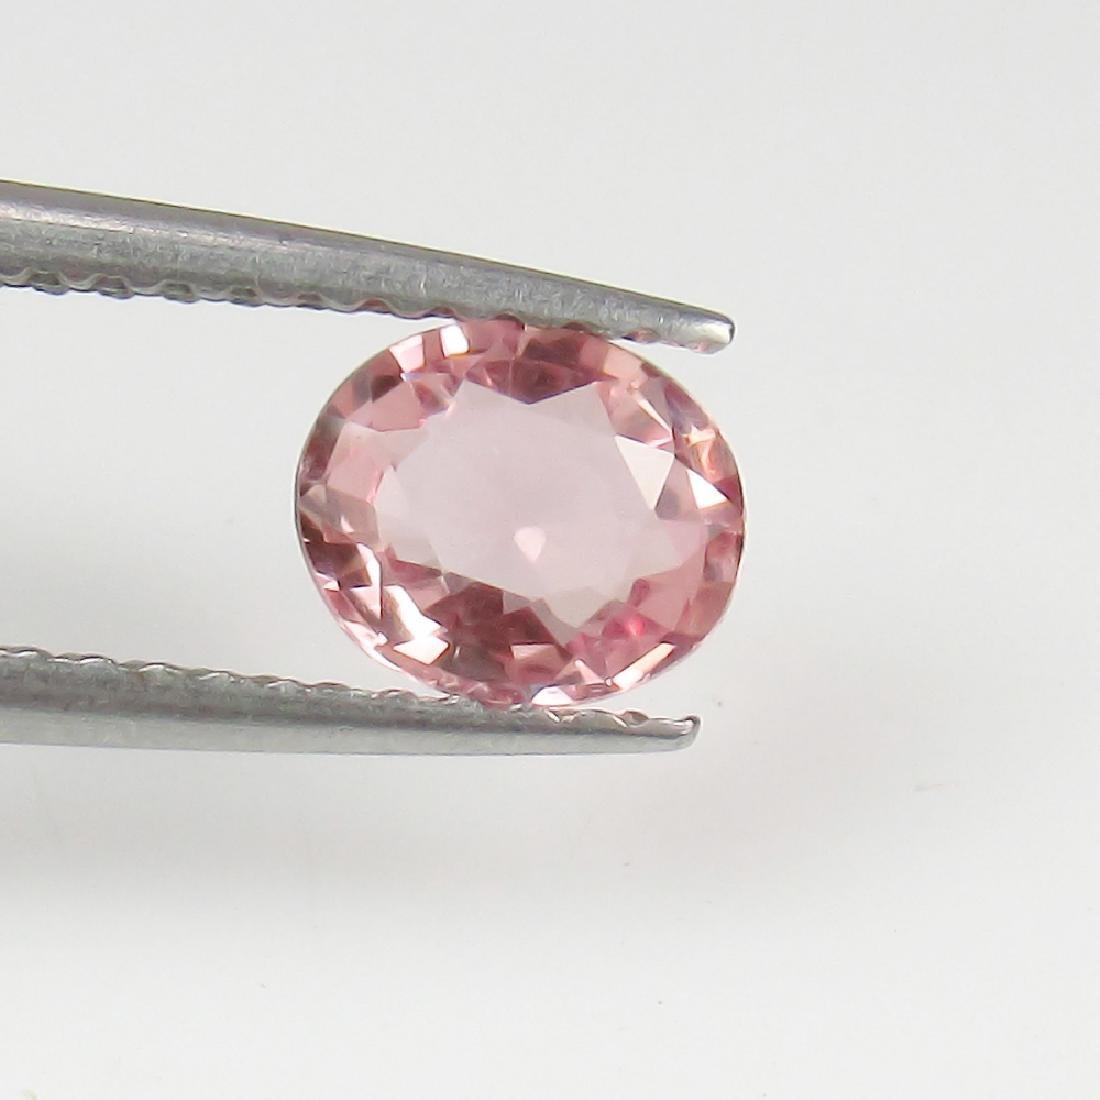 0.69 Ct Genuine Ceylon Unheated Sweet Pink Sapphire Top